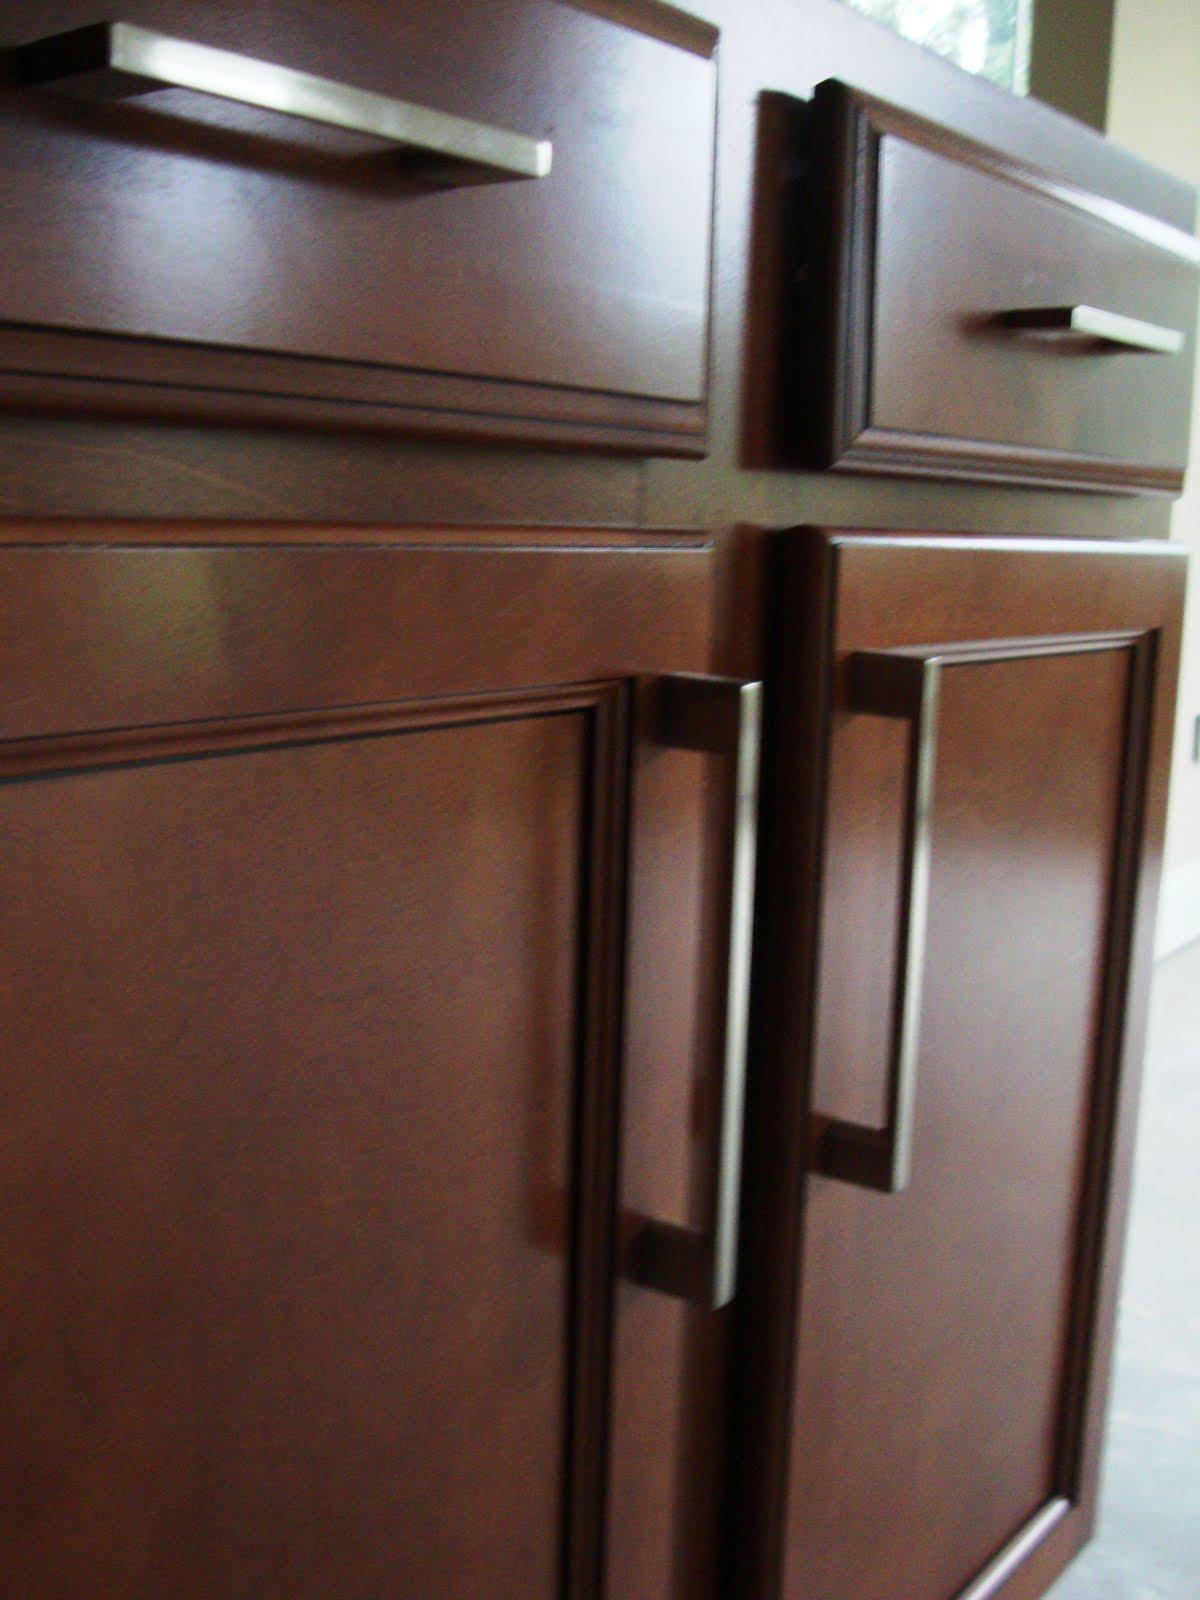 kitchen cabinet quiet closers kitchen cabinet door pulls kitchen cabinet hardware is my favorite The long satin nickel The